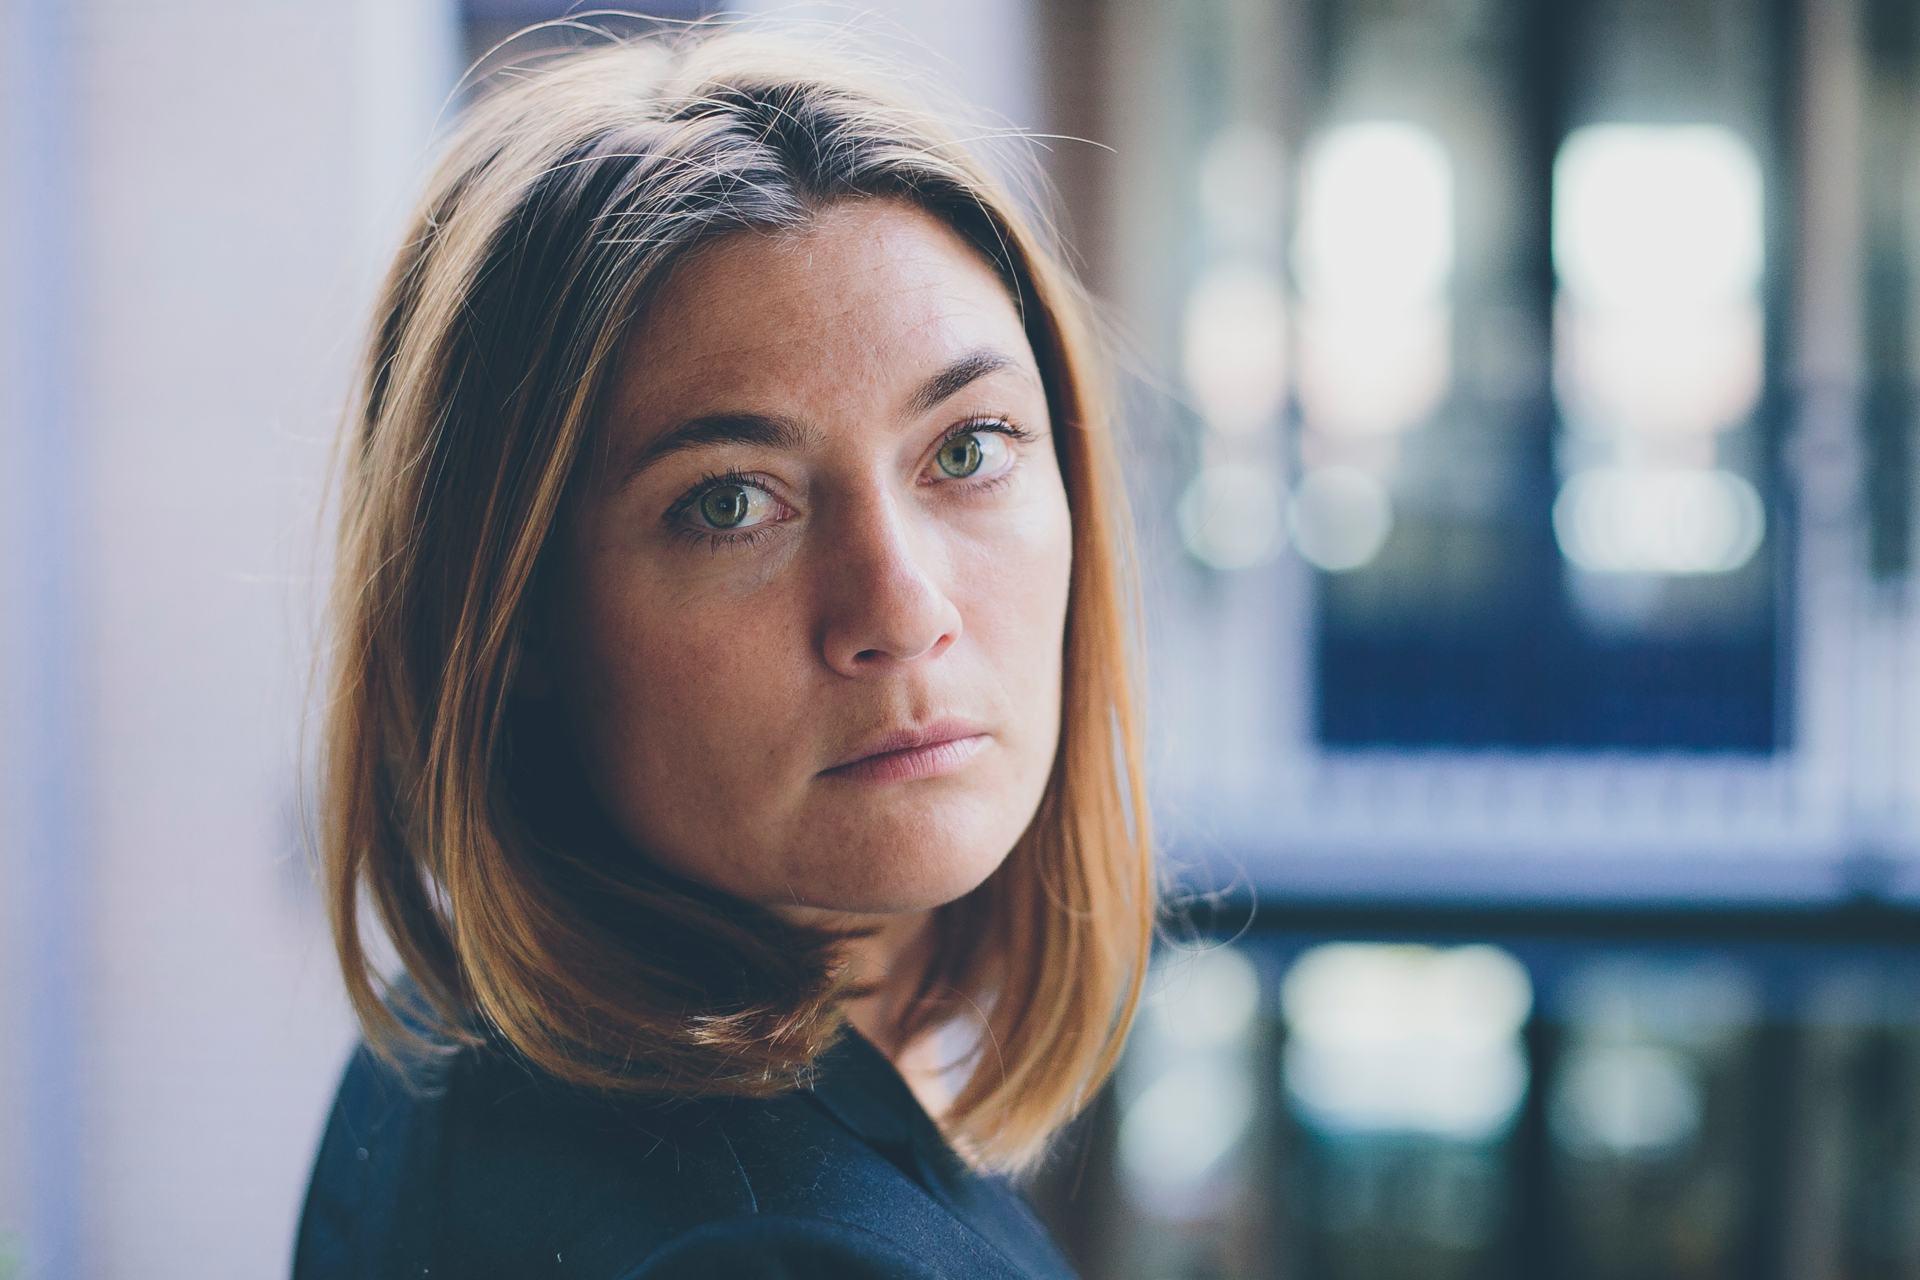 Hanneke_Scholten_Actrice_Portret01